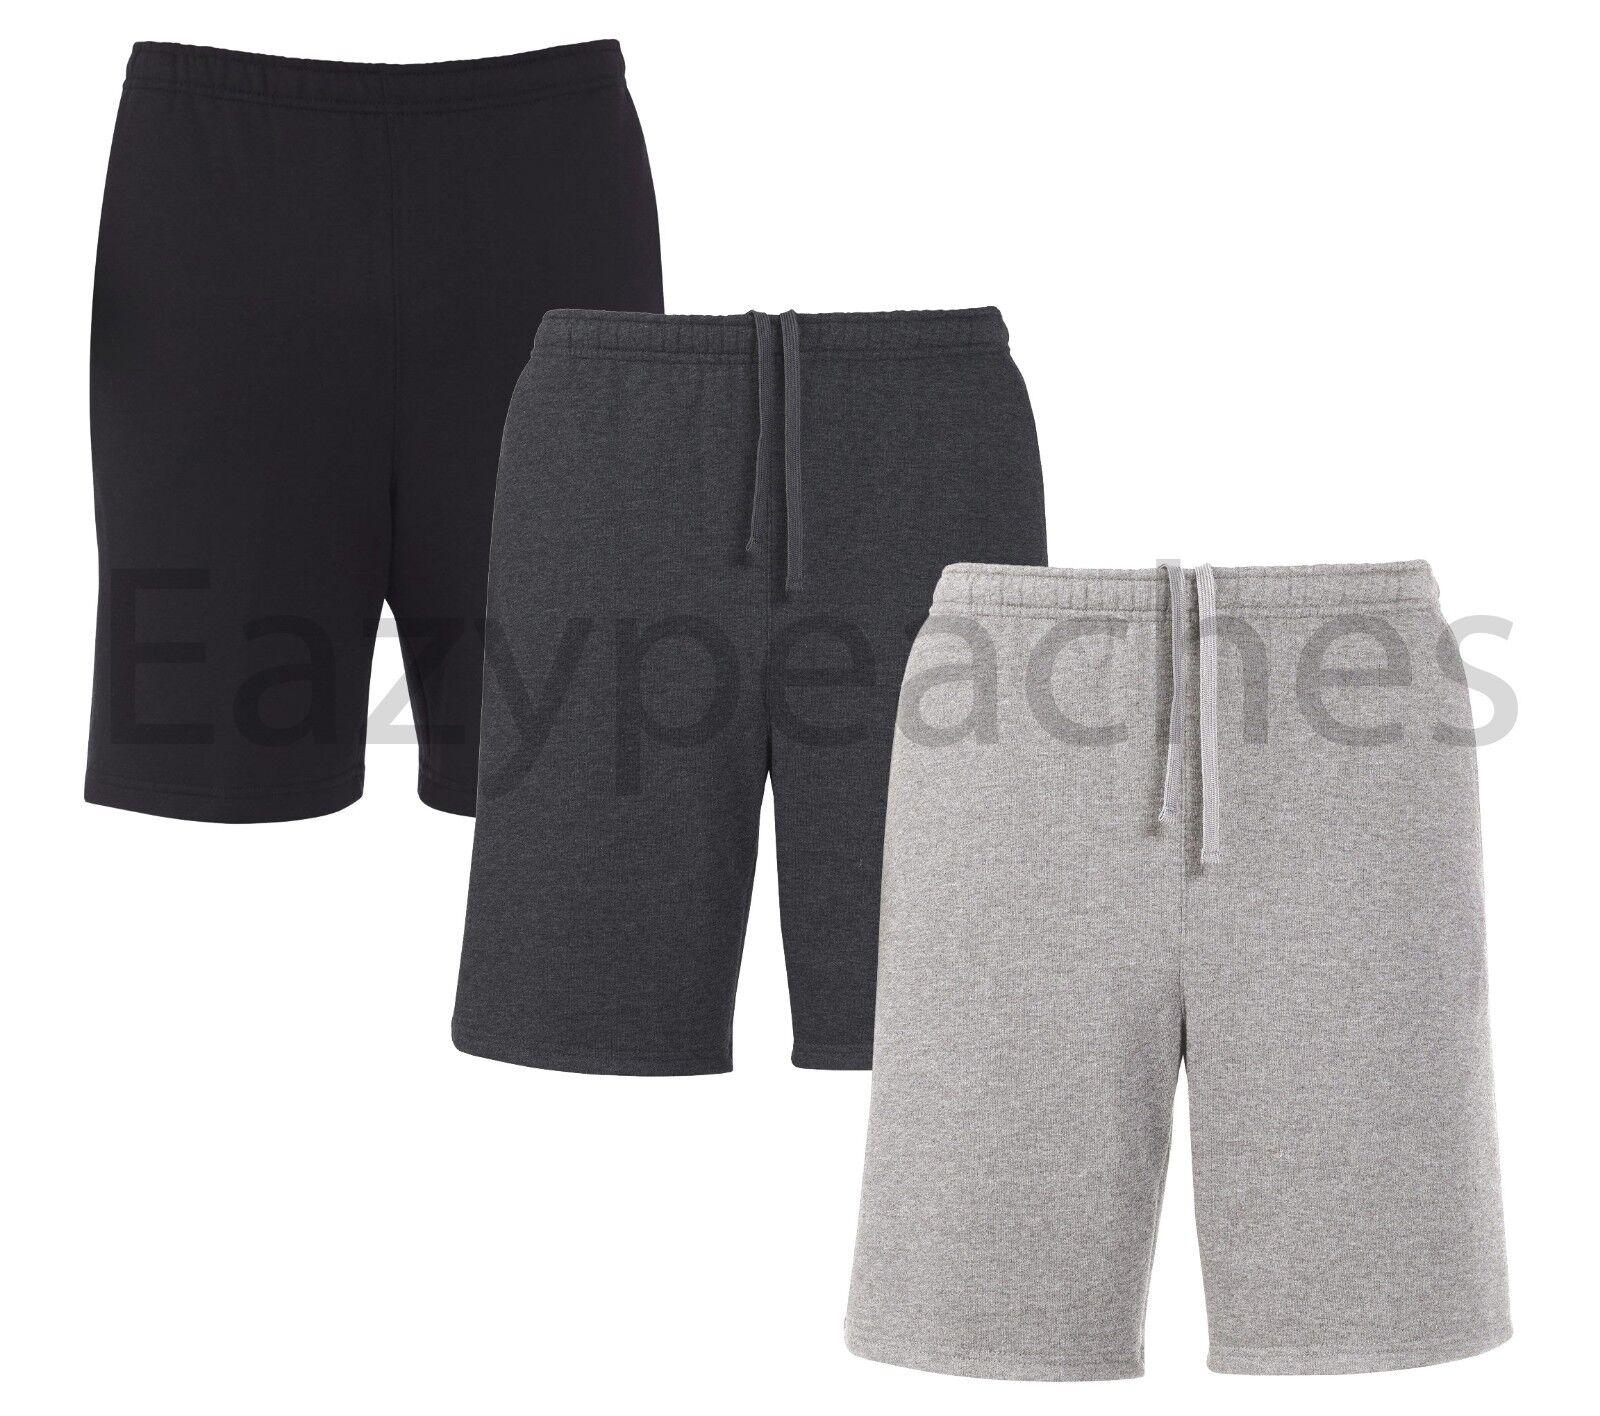 Russell Athletic - Men's Size S-3XL Fleece Sport Shorts w/ P